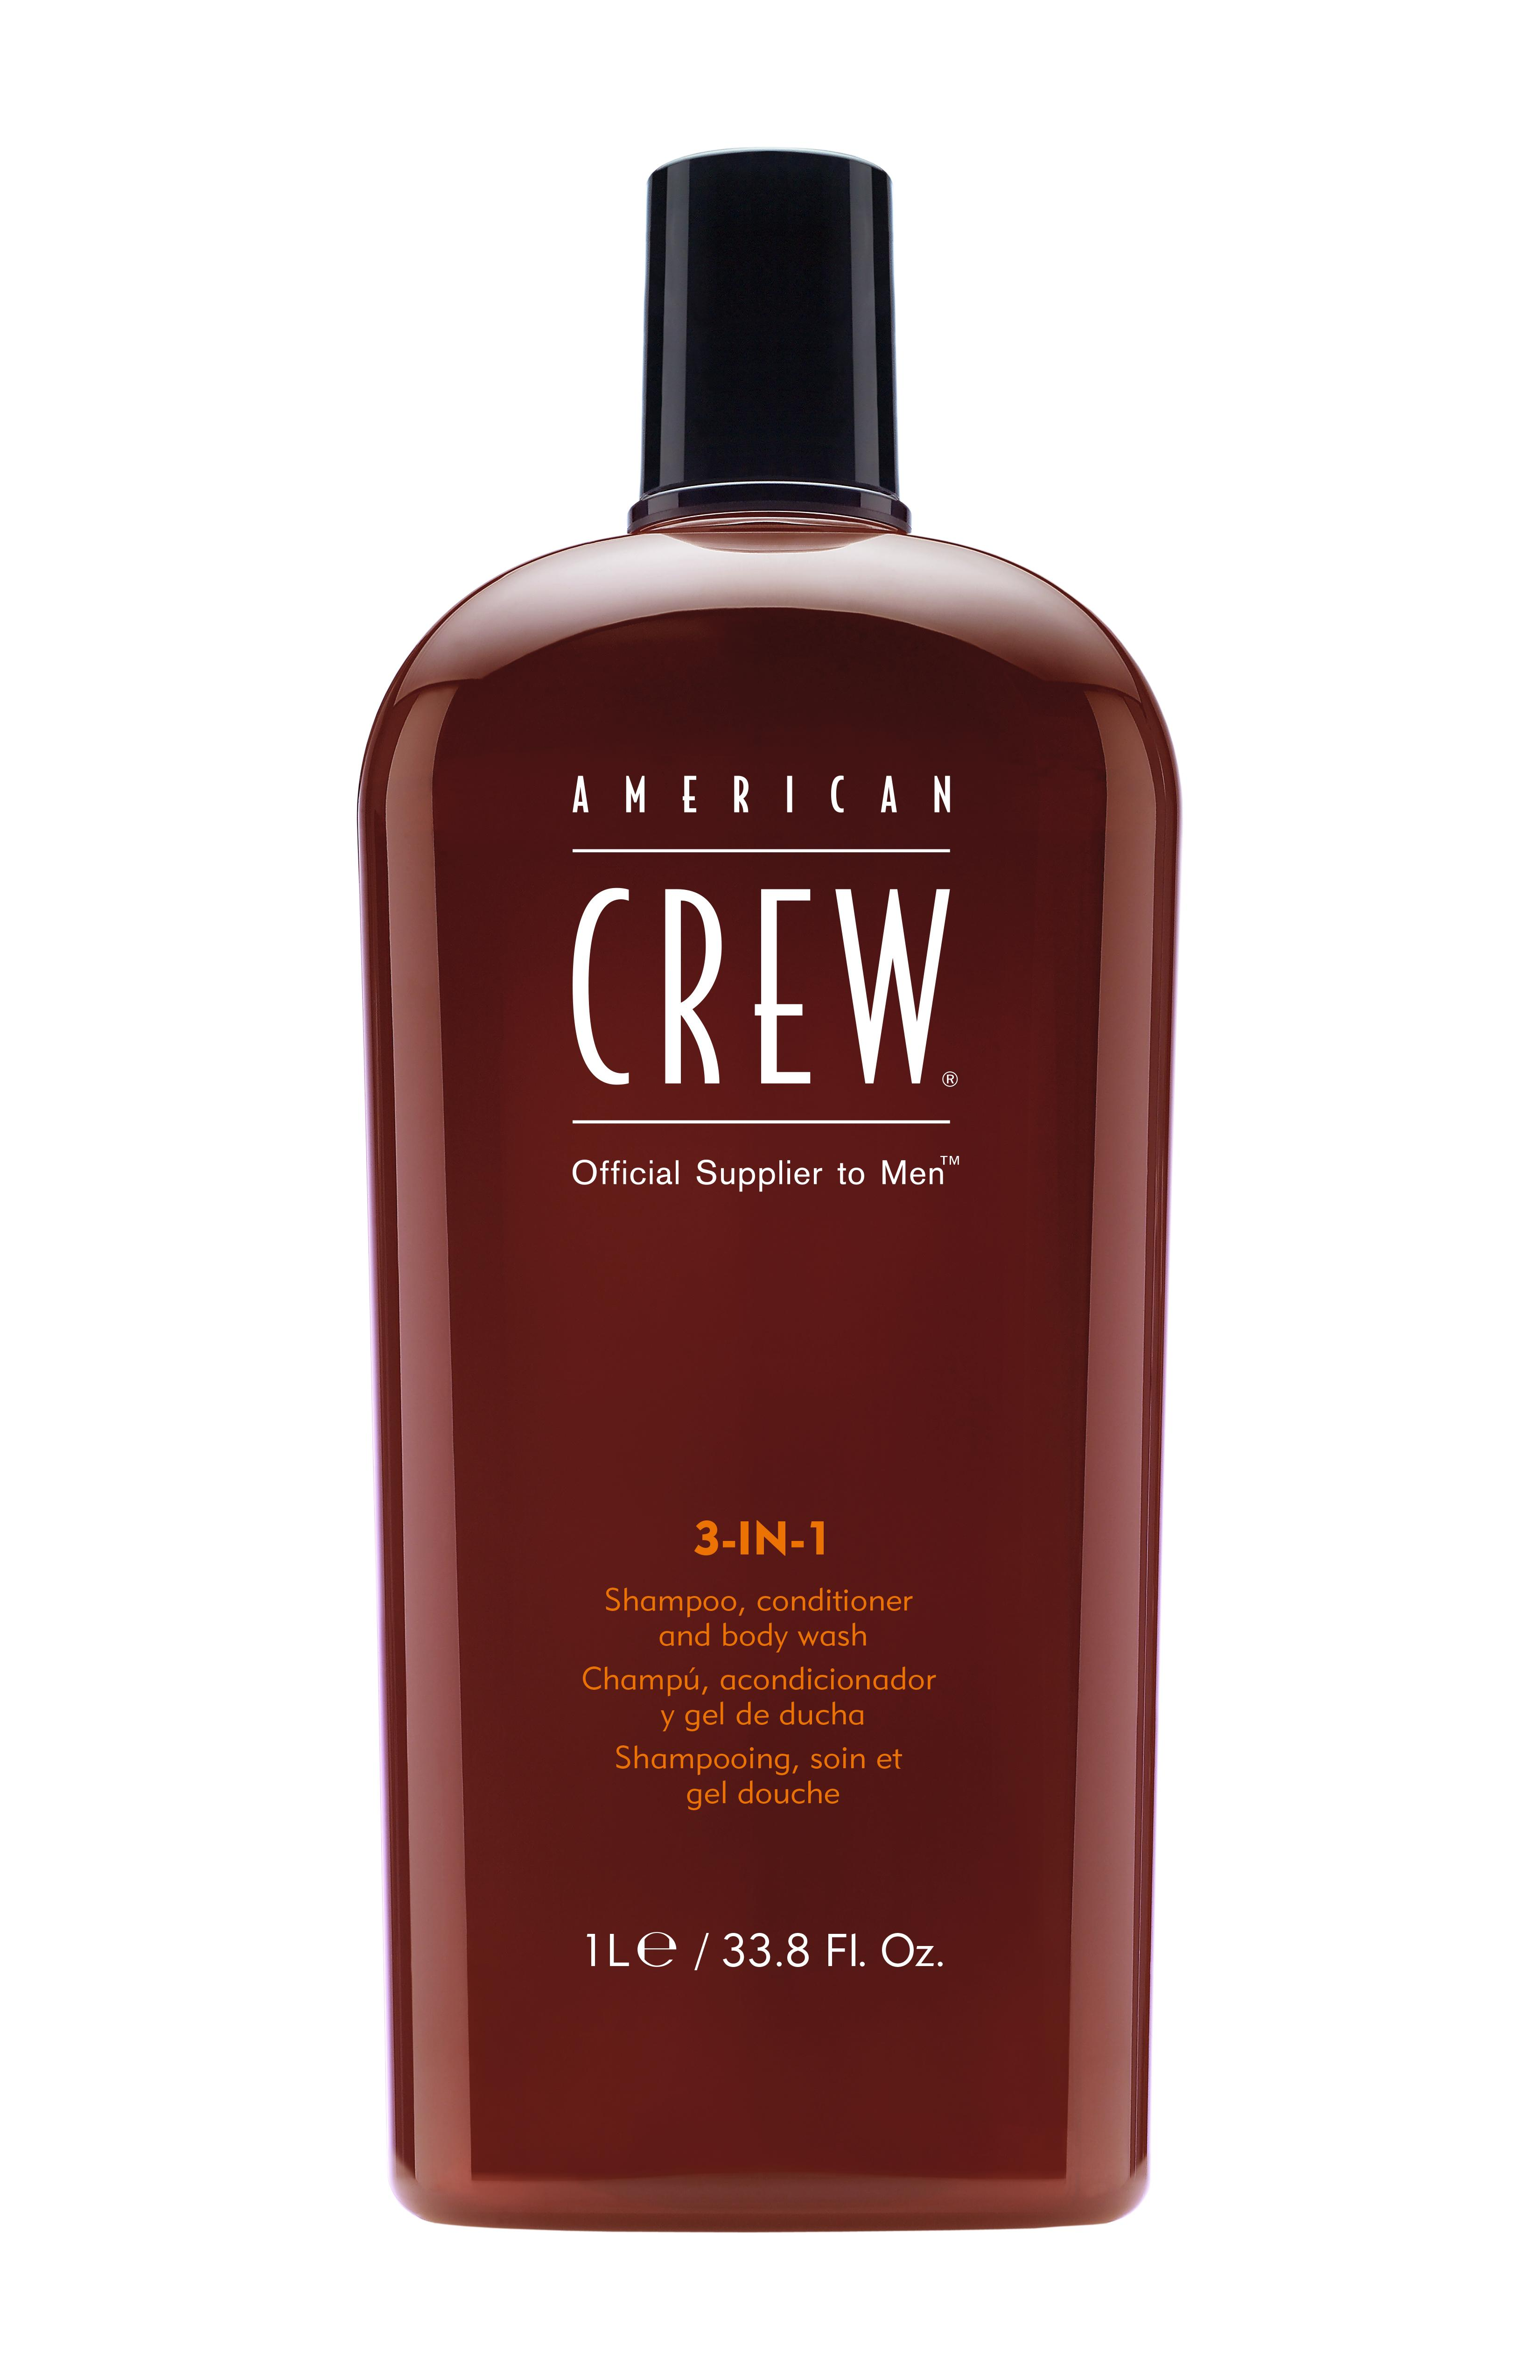 American Crew 3-in-1Shampoo